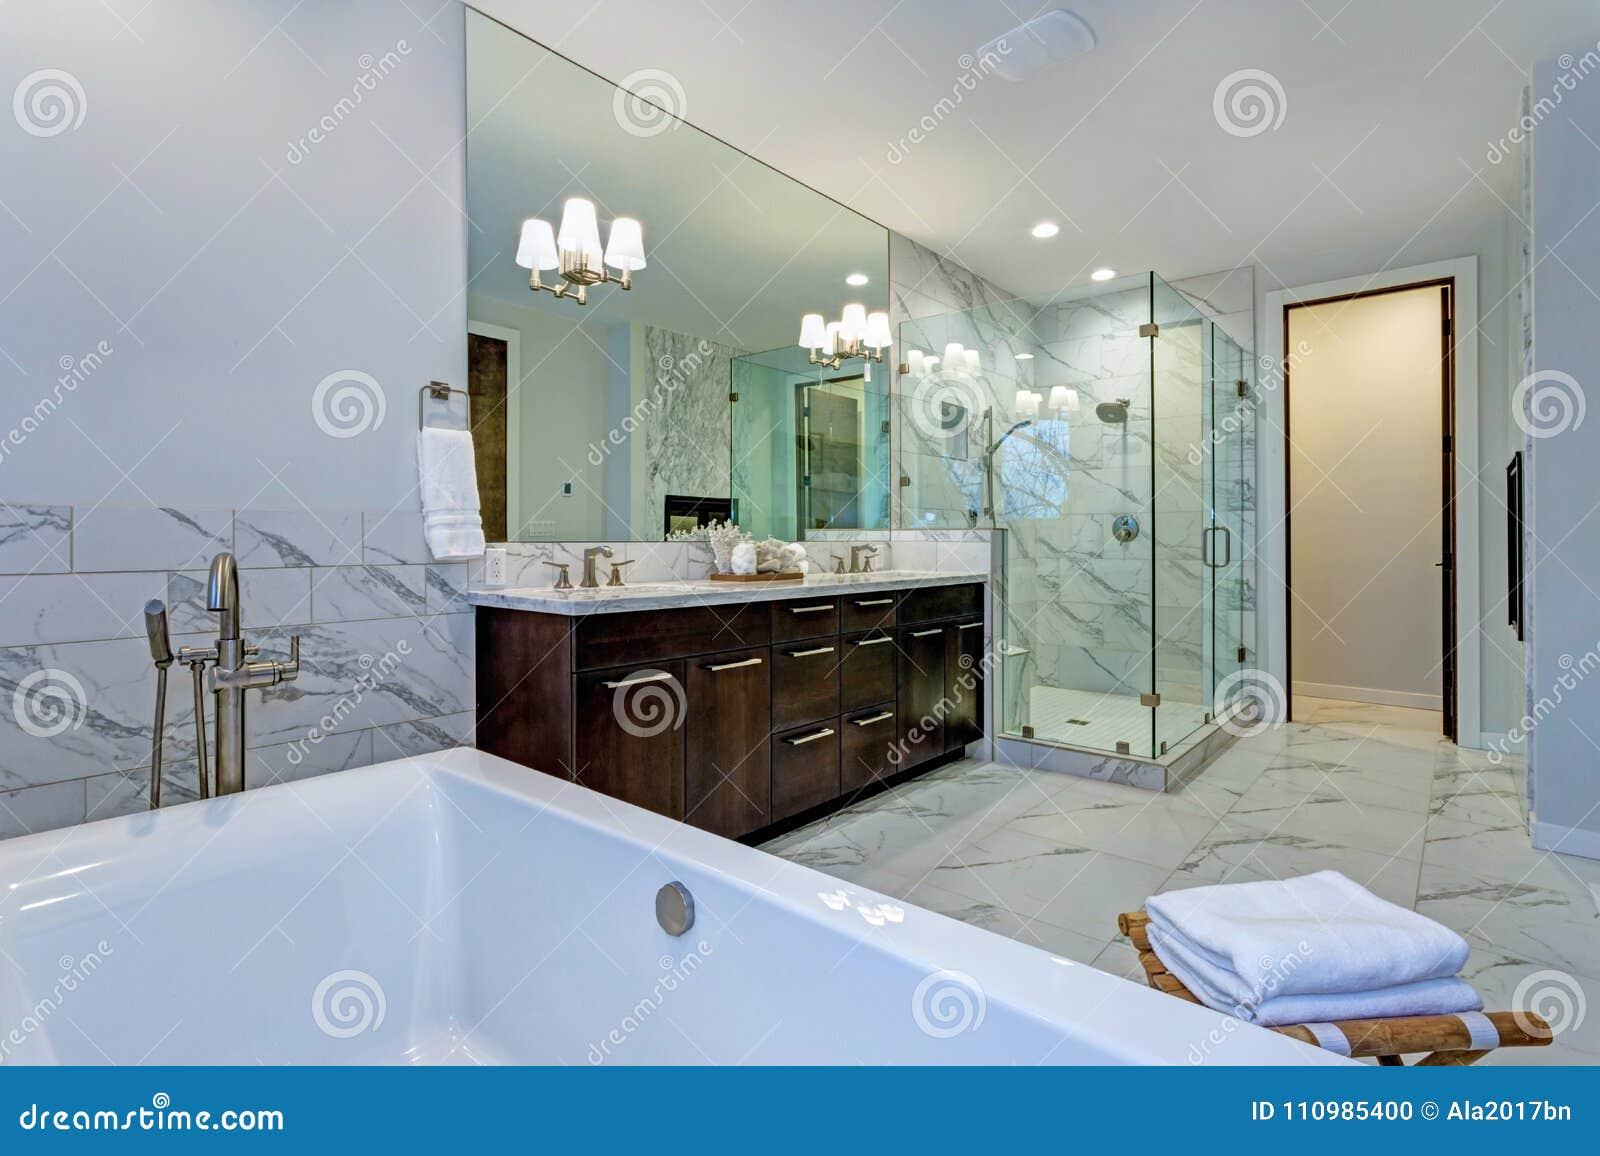 Incredible Marble Bathroom With Fireplace Stock Photo Image Of Bathroom Custom 110985400